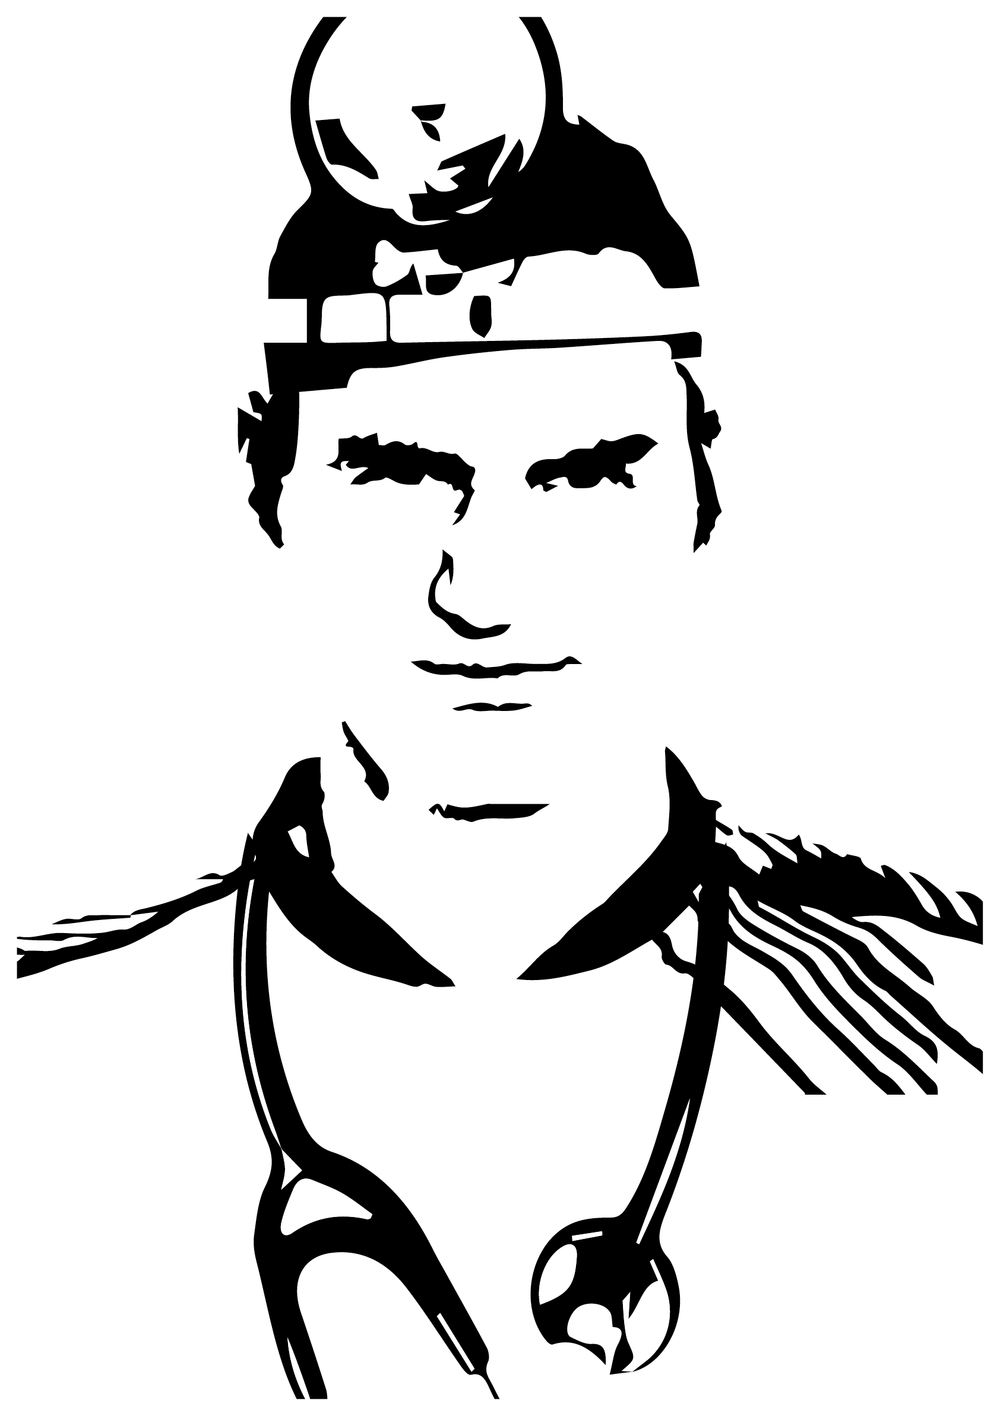 Dr Eeredoggter Federer isch sit sym Titel anderscht druff,  Är wärdi Sportarzt und miech z Wollerau e Gmeinschaftspraxis uff.  Und als Hilf bim Operiere, falls es ammen e bitz harzt,  Empfääle mir dr Constantin no als Narkosenarzt.